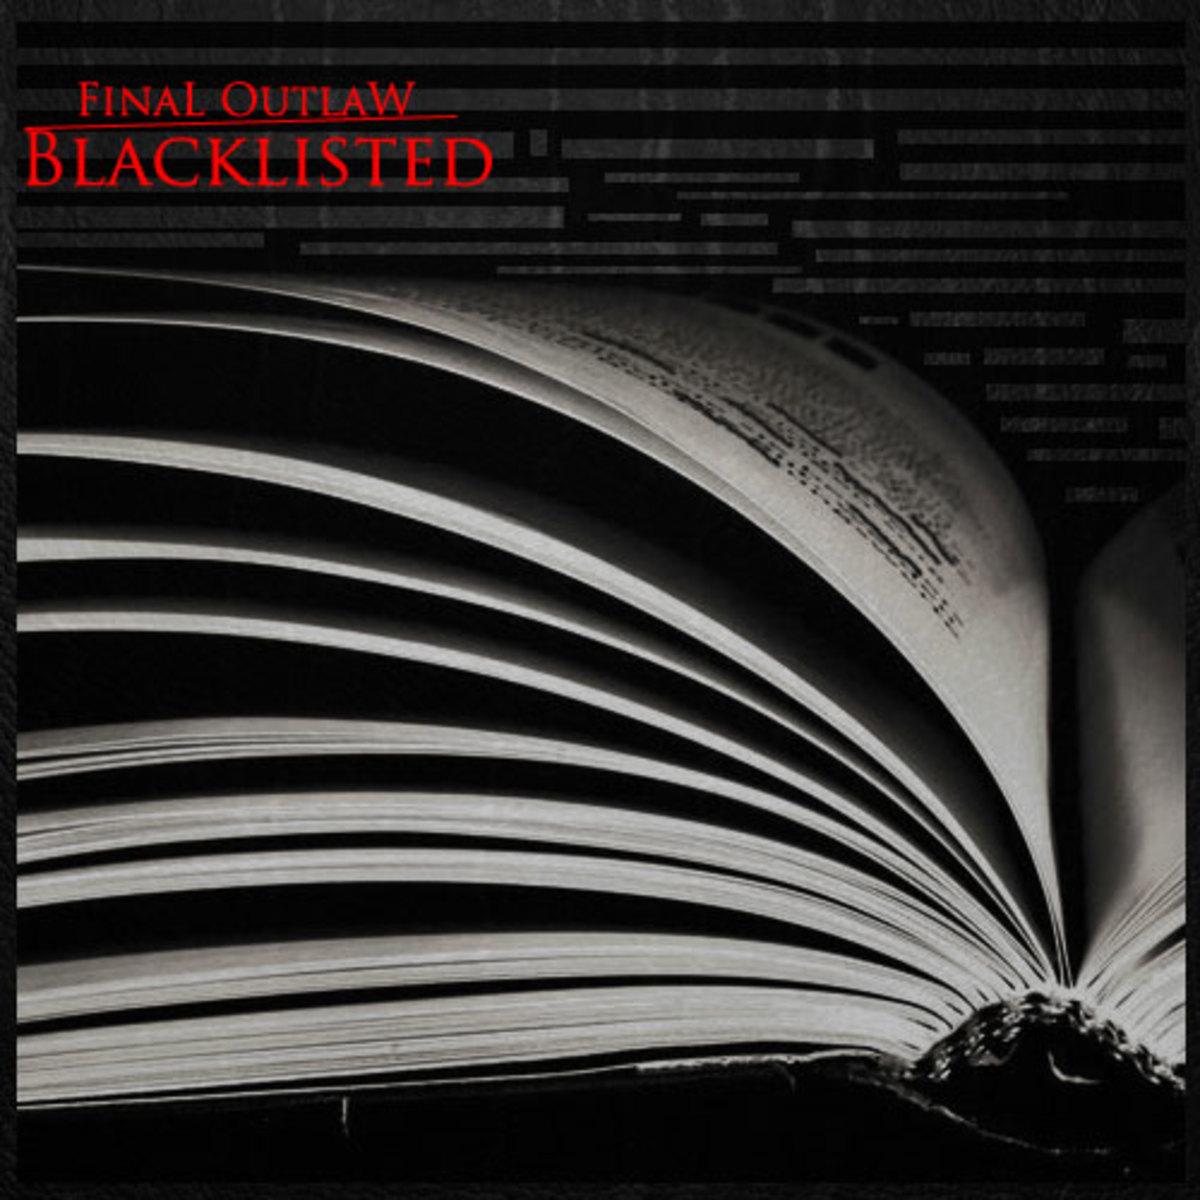 finaloutlaw-blacklisted.jpg